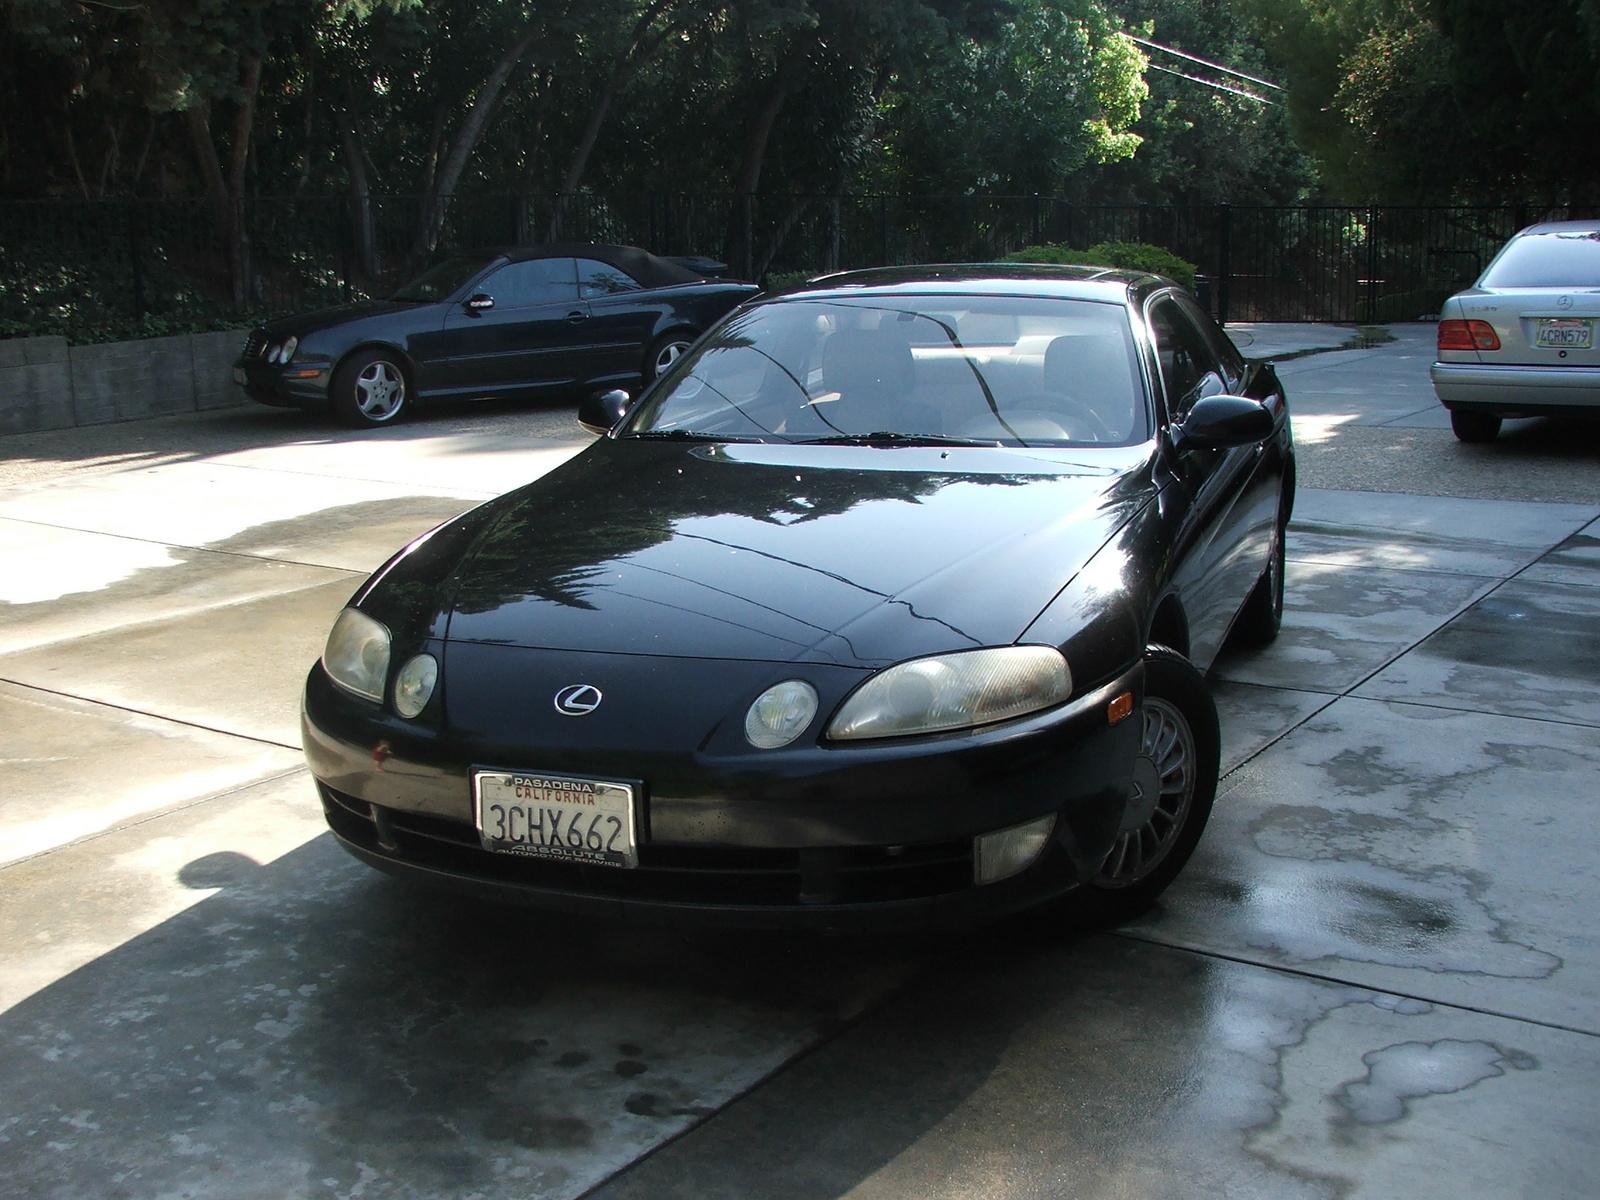 Lexus Lx 470 Headlight Diagram Free Engine Image 2005 Gx Fuse Box 2003 Get